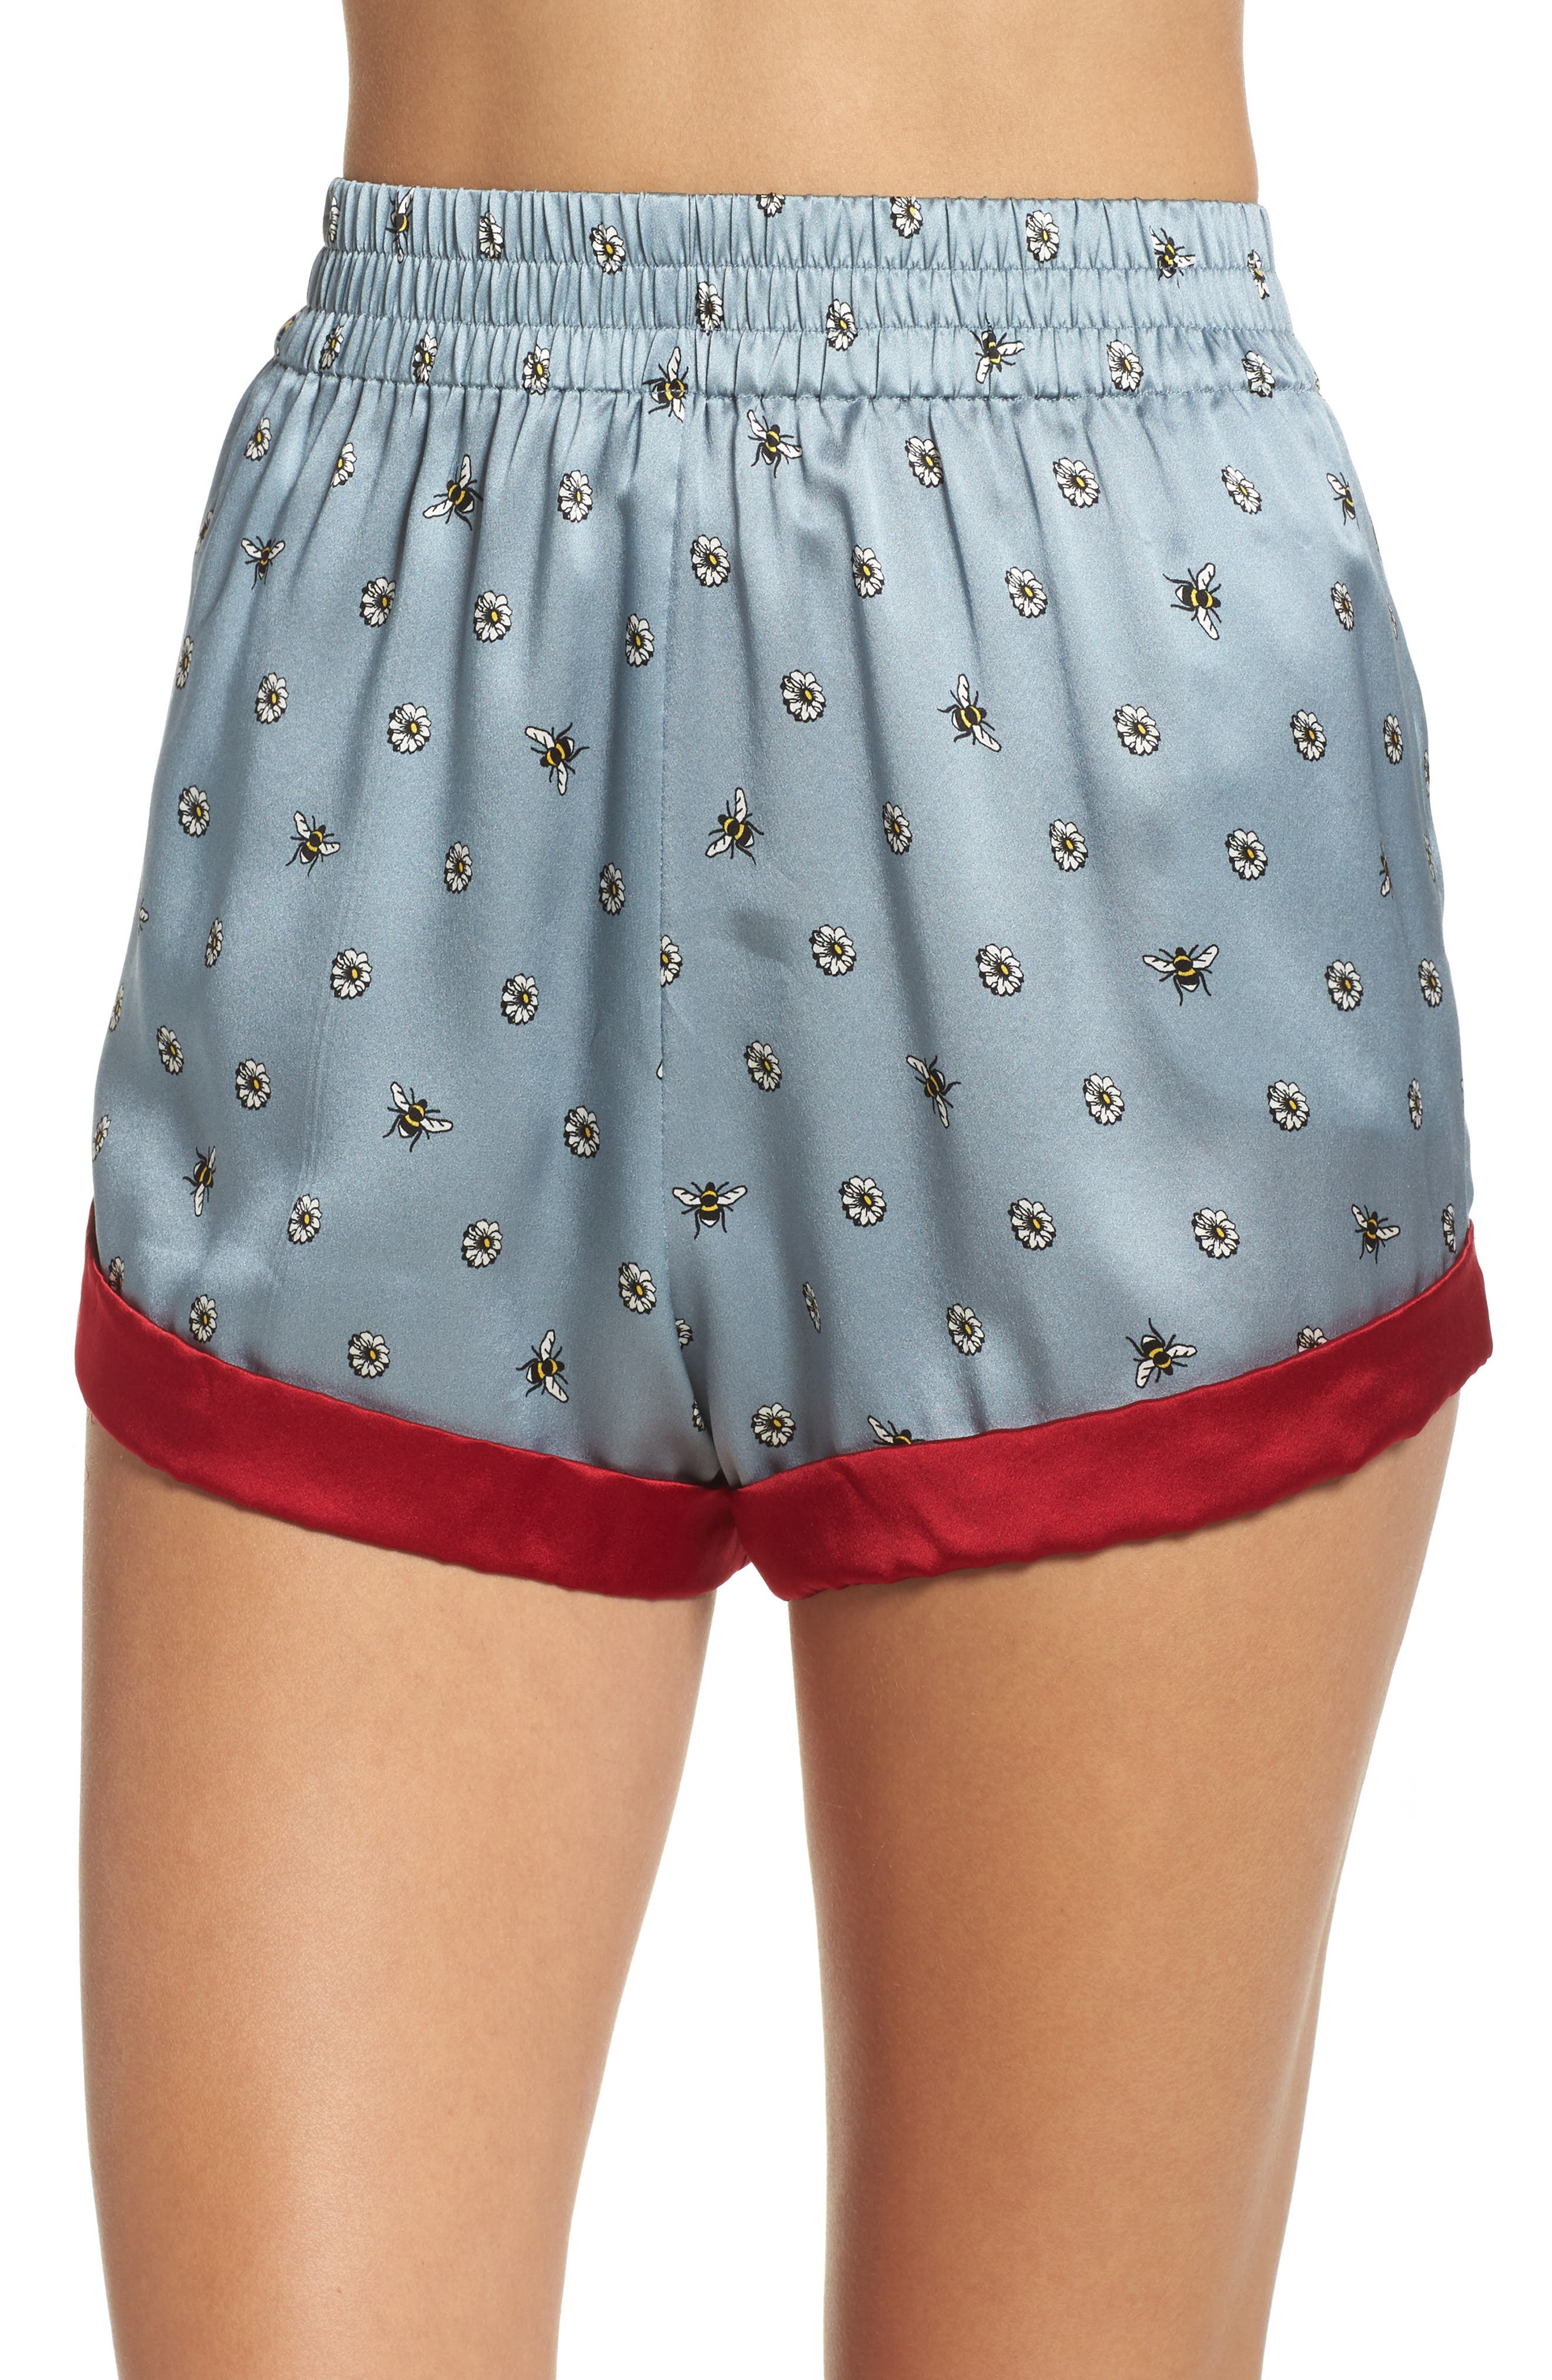 Chloe Silk Pajama Shorts,                         Main,                         color, 490